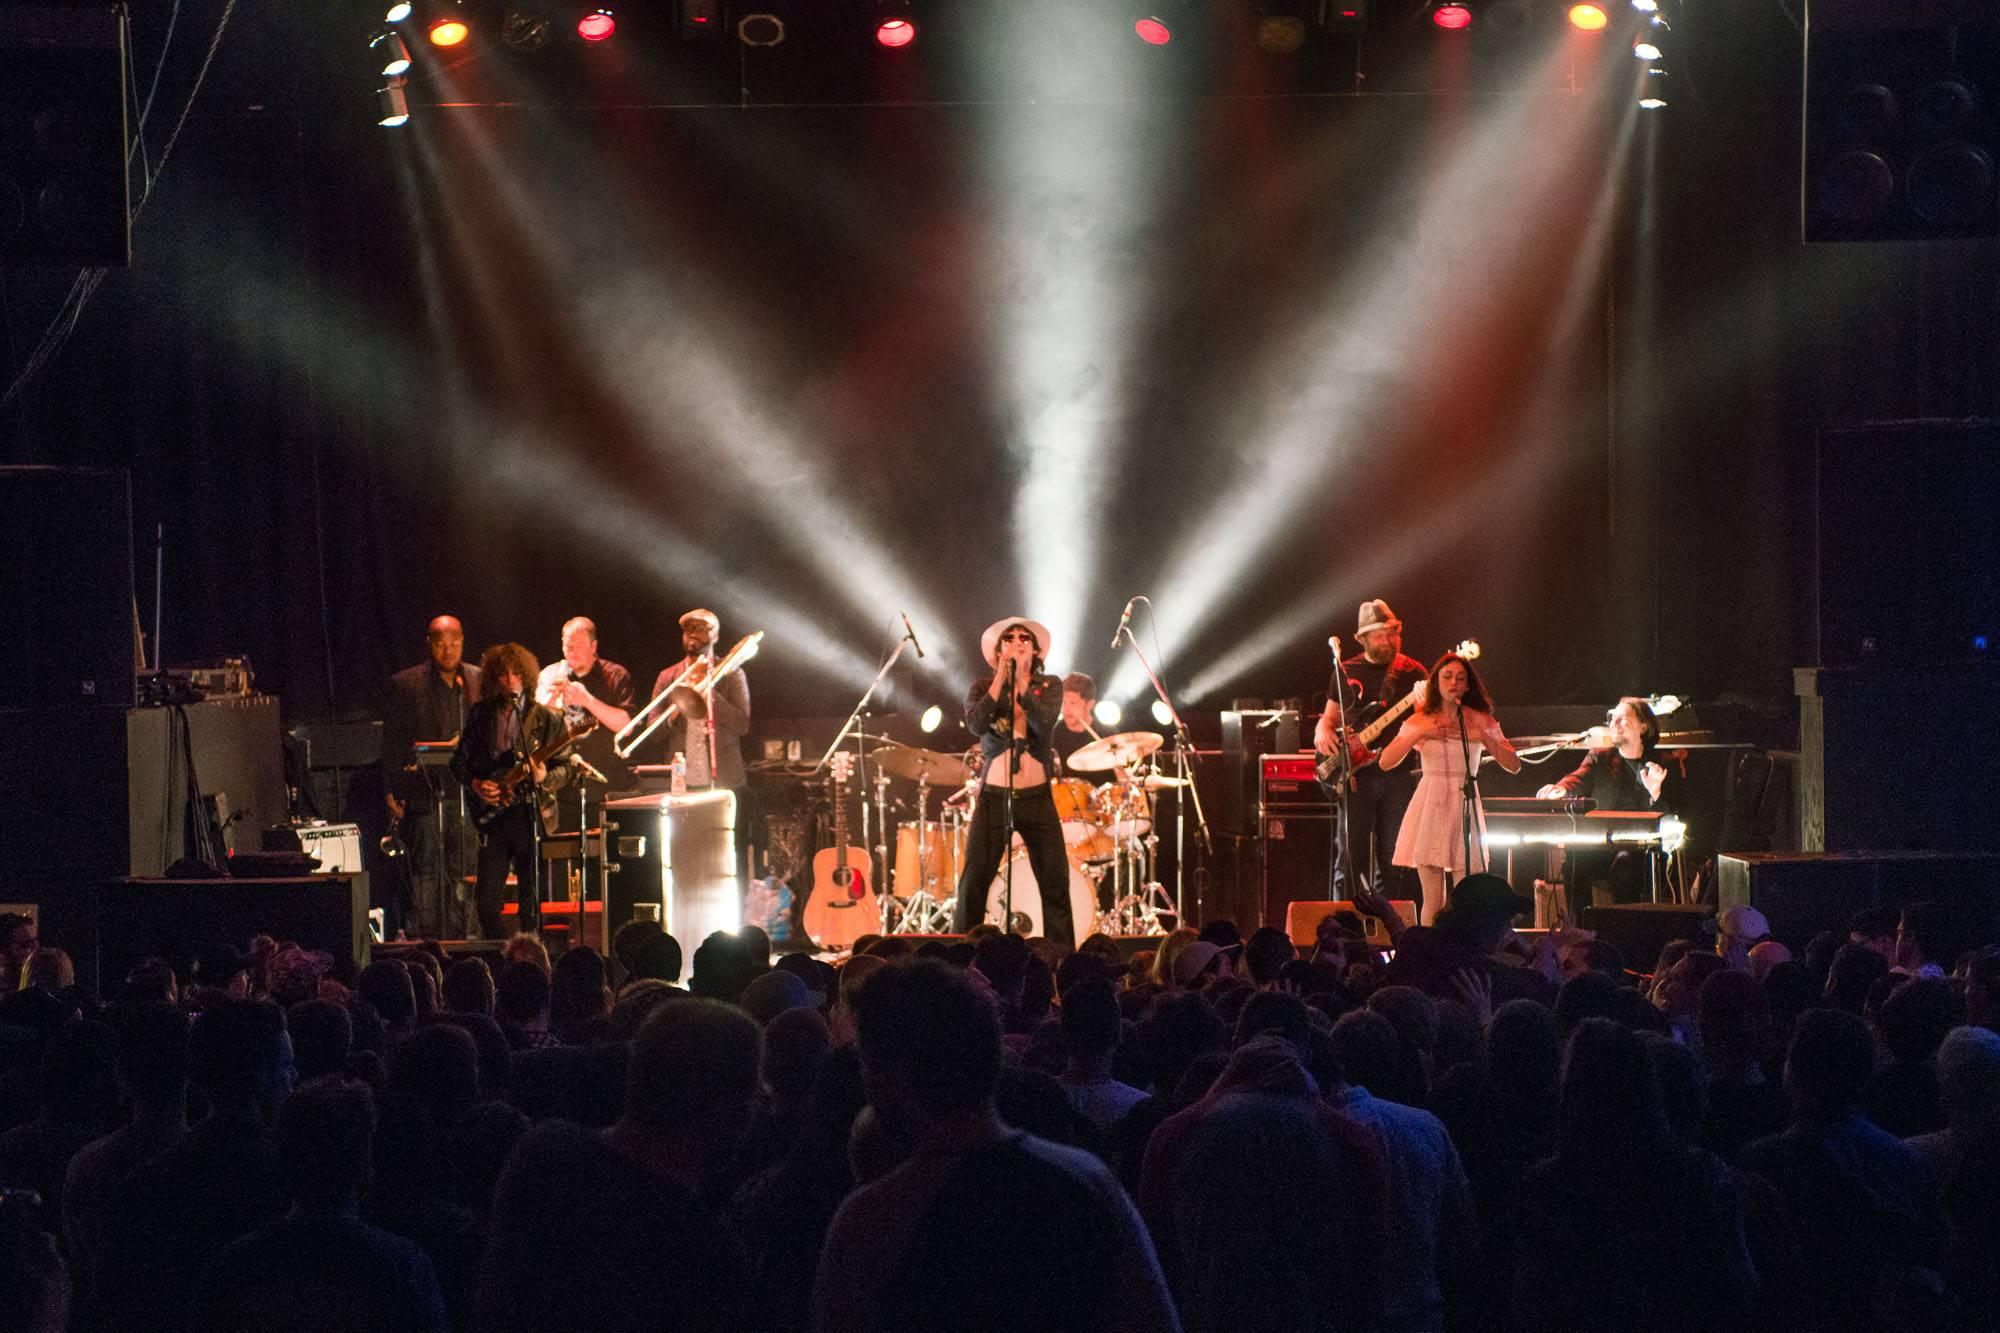 Foxygen at the Rickshaw Theatre, Vancouver, May 25 2017. Jessica Vandergulik photo.